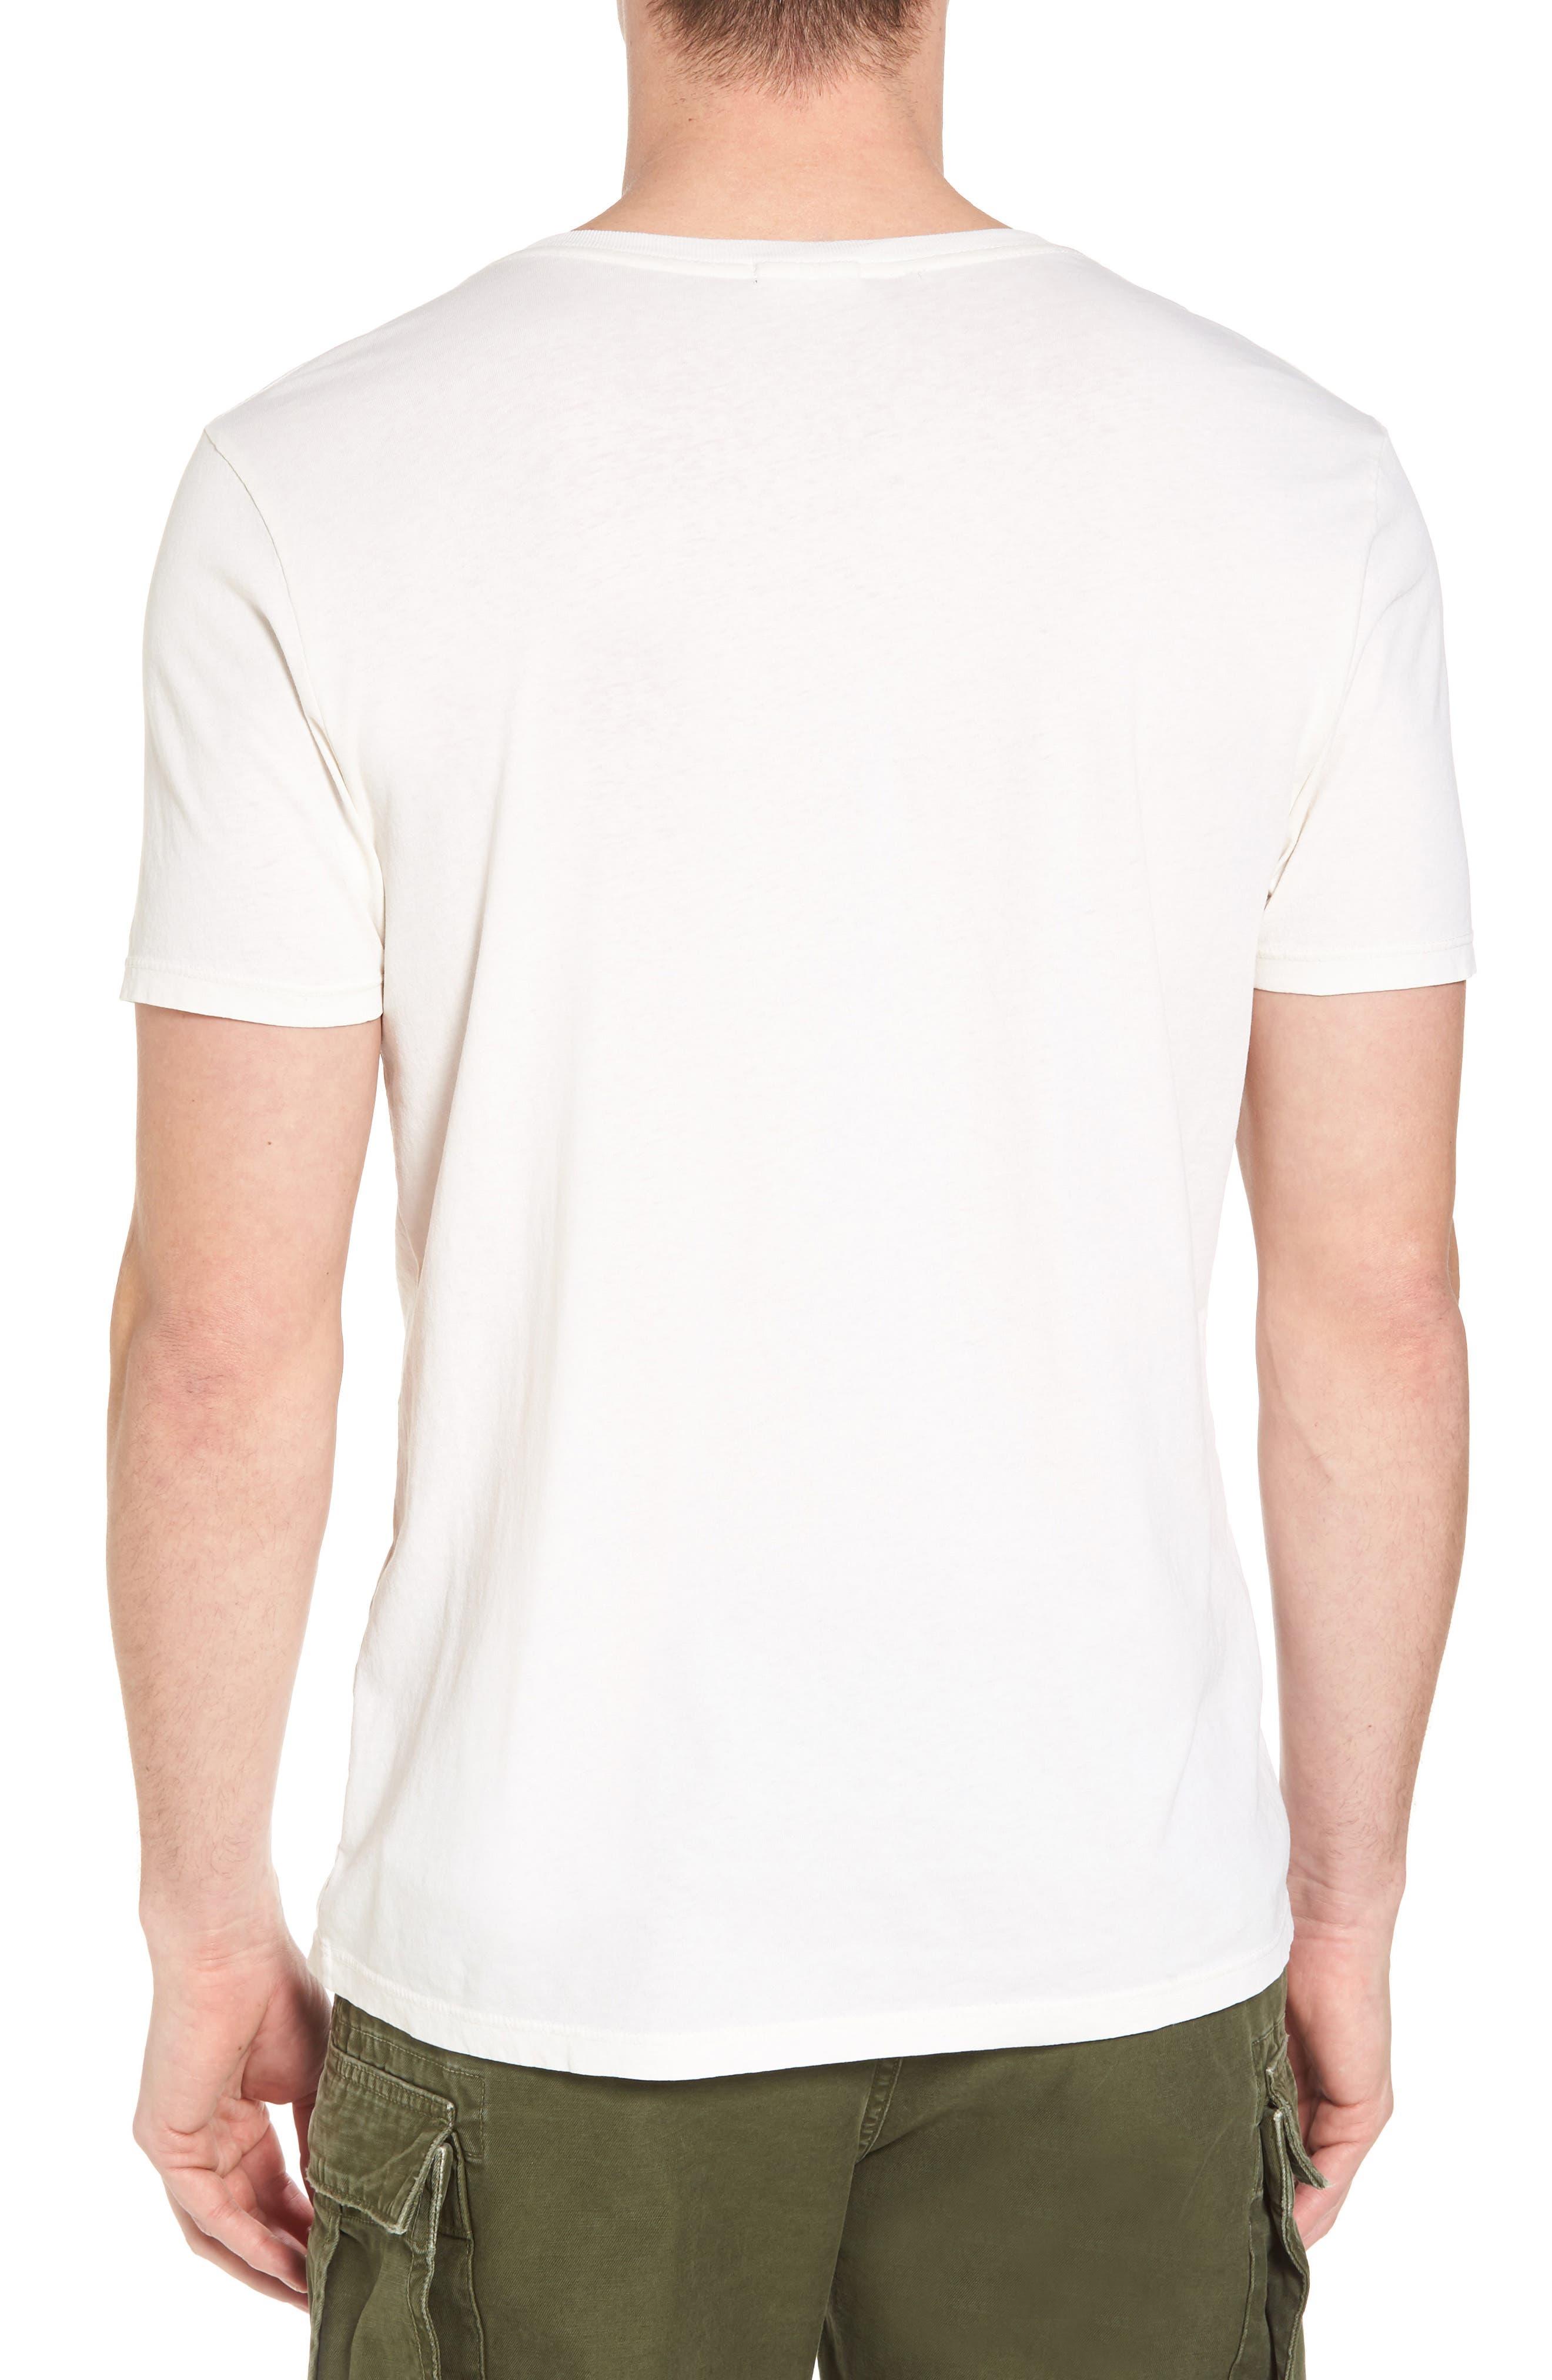 Greene Street Vintage Graphic T-Shirt,                             Alternate thumbnail 2, color,                             Off White